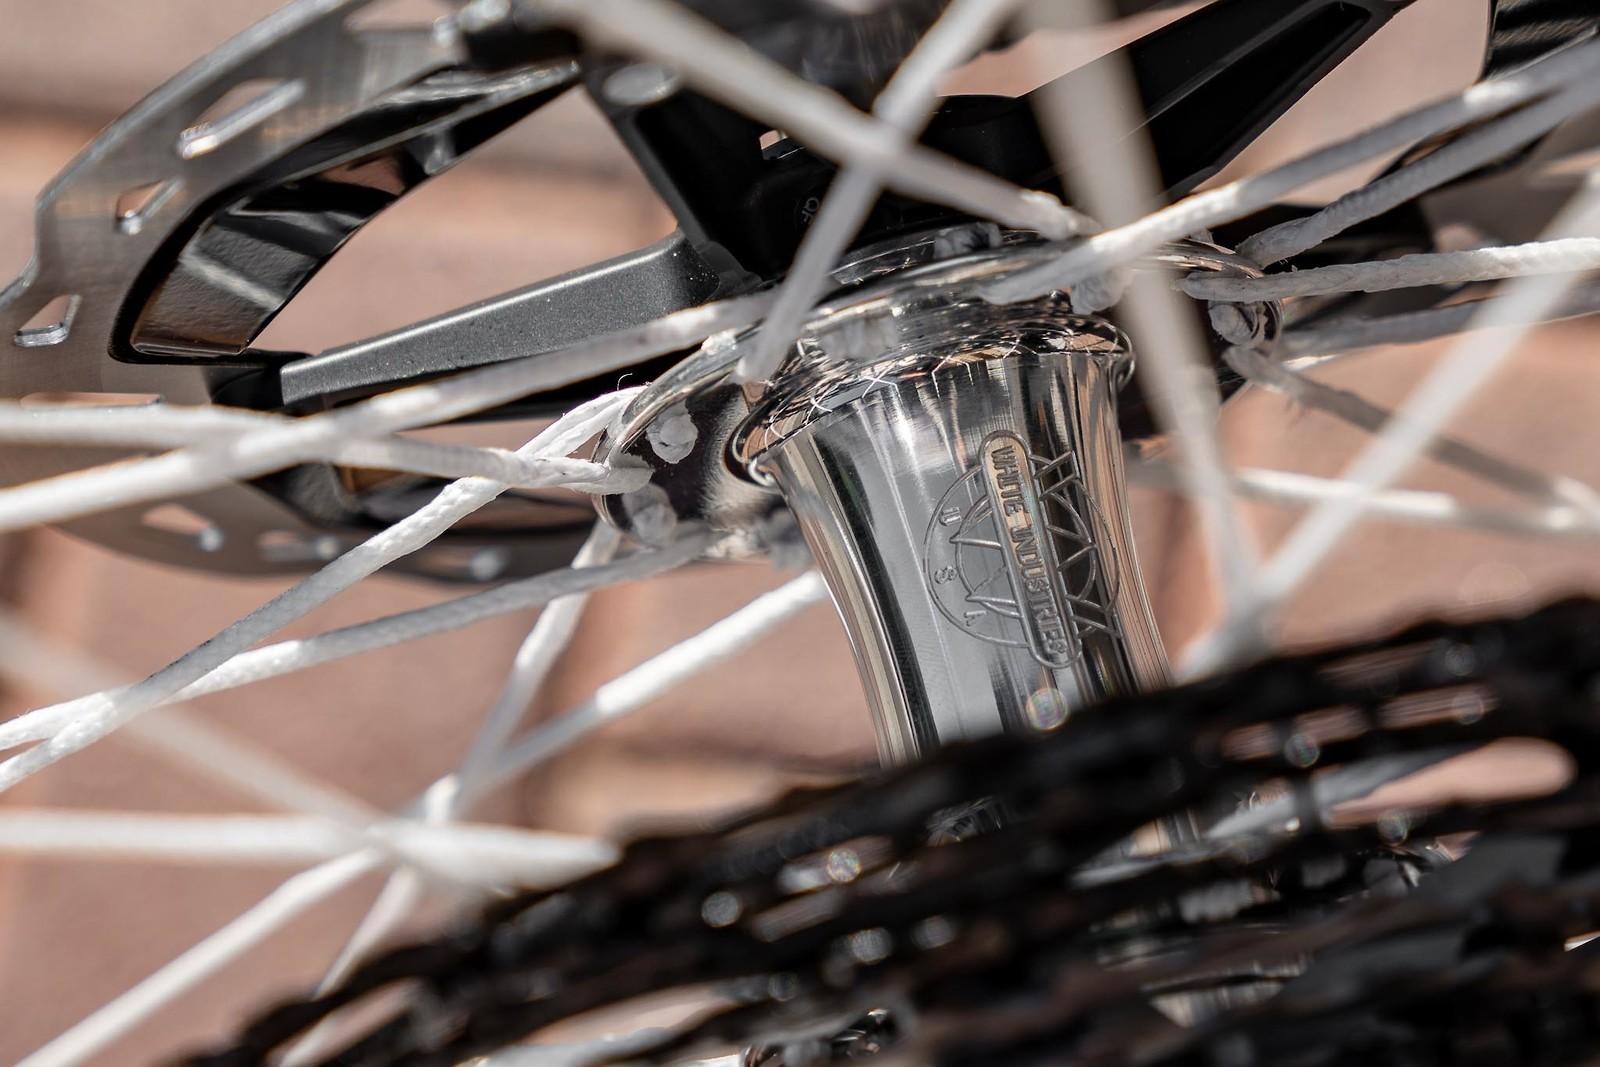 Why That Bike? | Orbea Rallon - Mountain Bikes Feature Stories